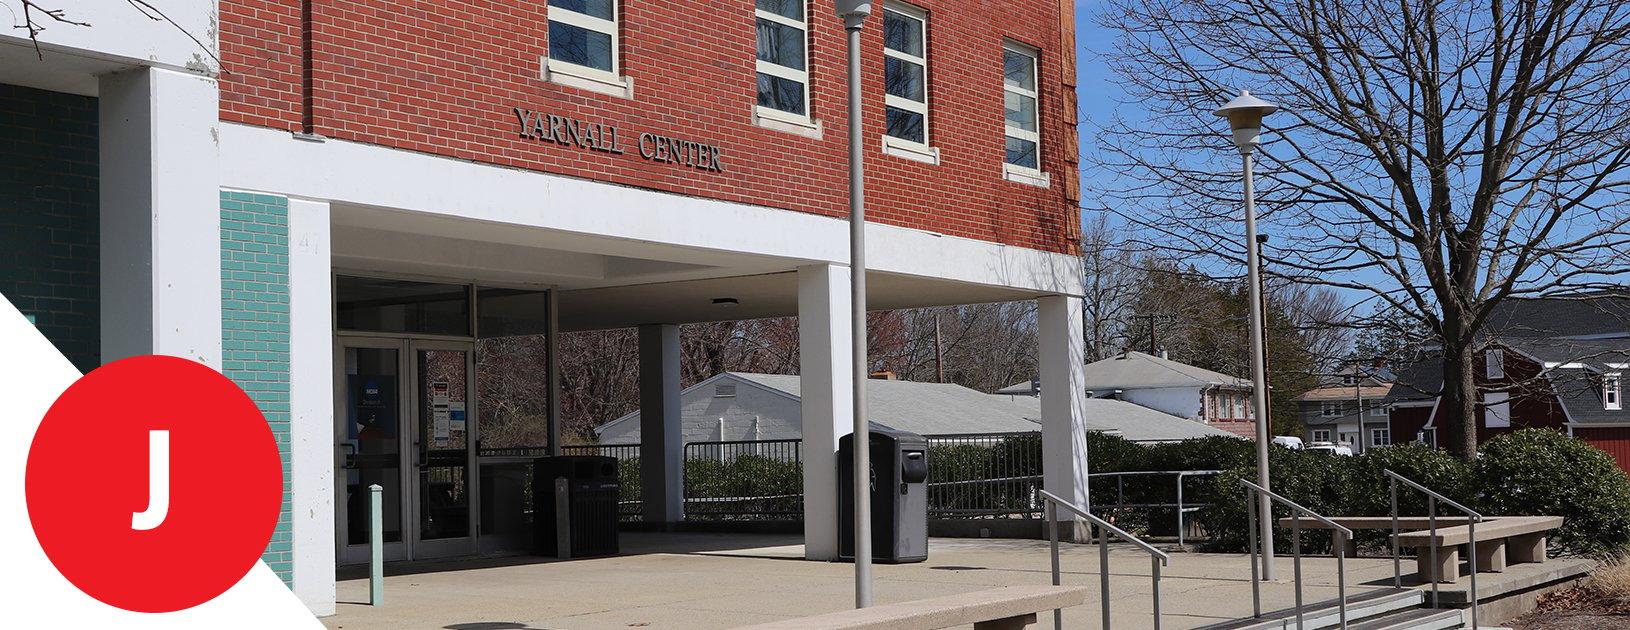 Campus Tours Drive Through Tour, Mitchell College